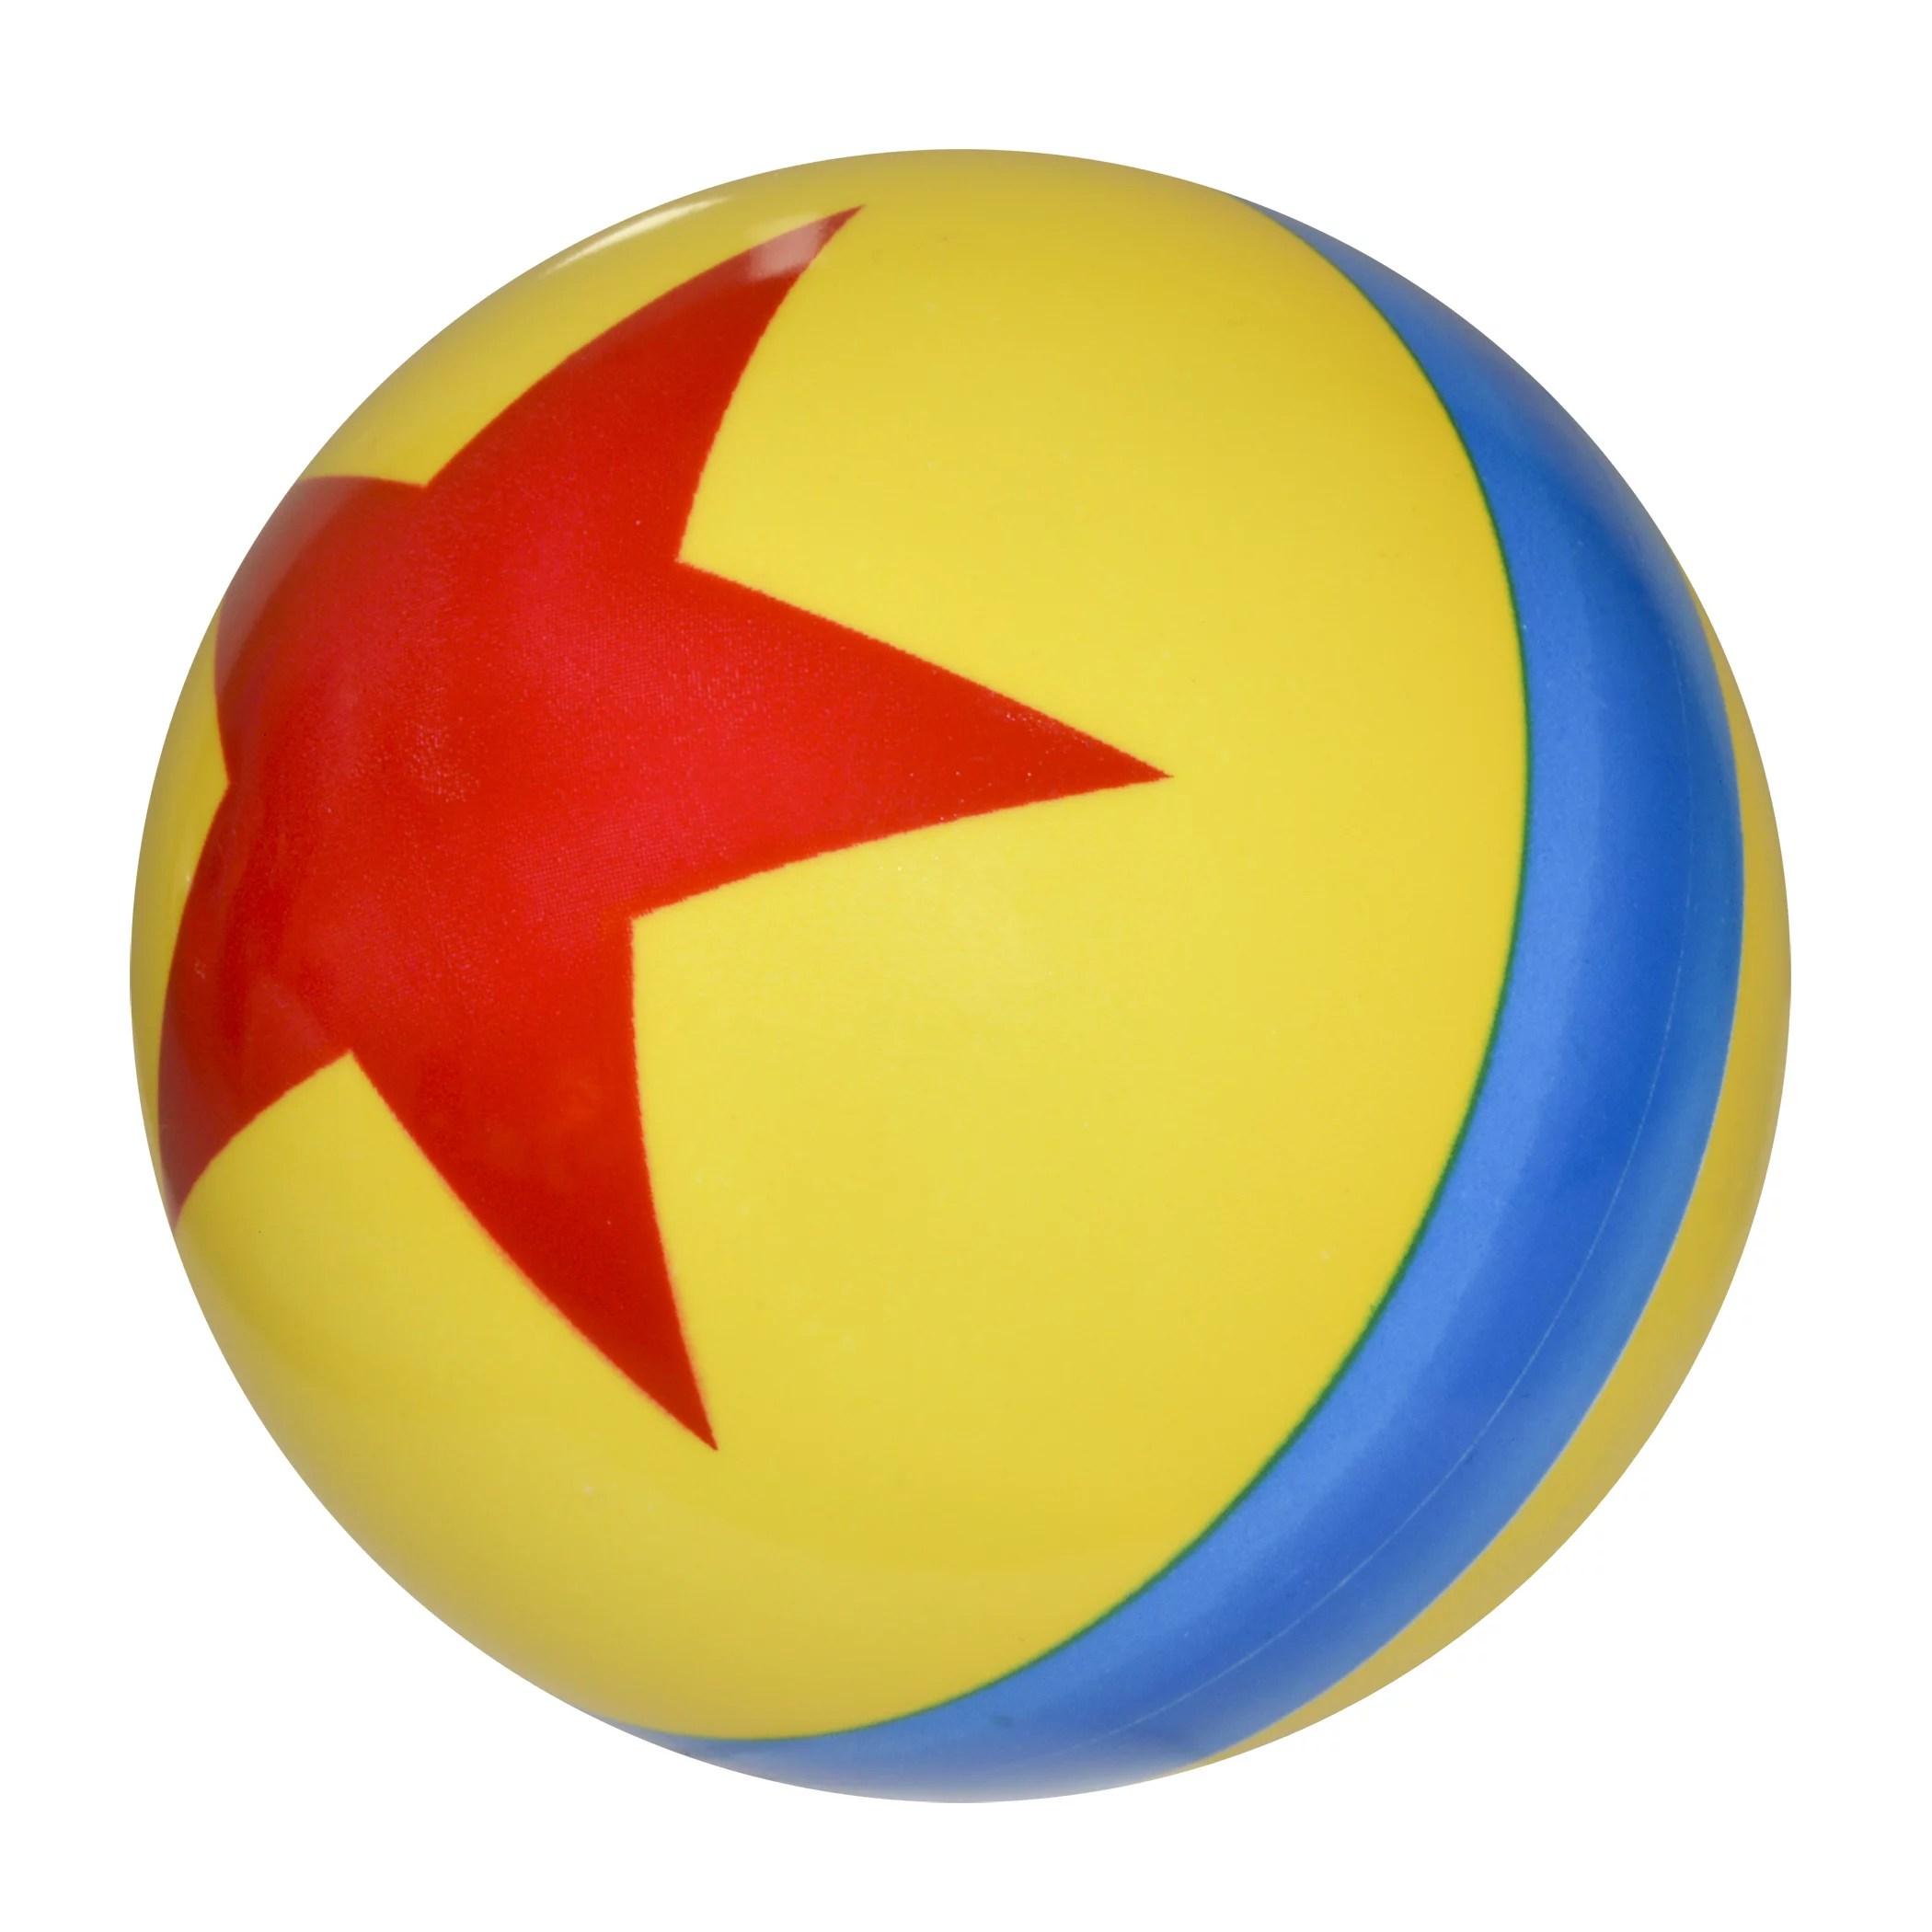 hedstrom toy story luxo playball 10 inch walmart com